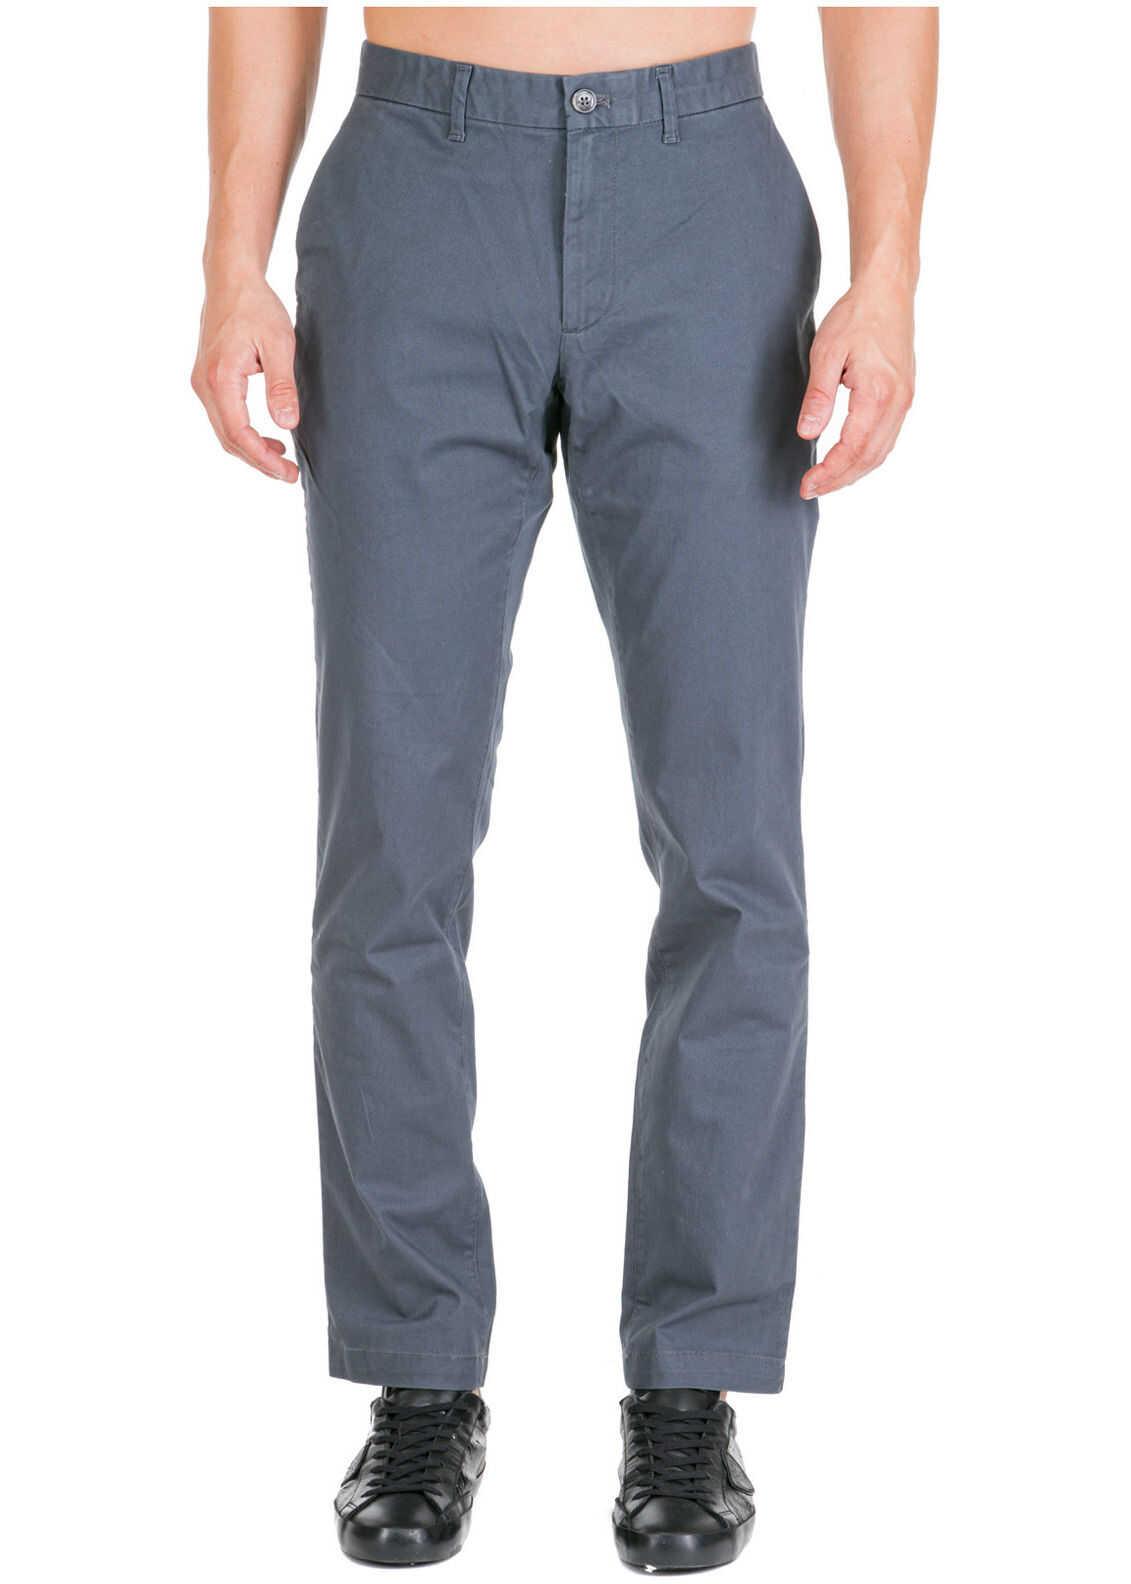 Michael Kors Jeans Denim Grey